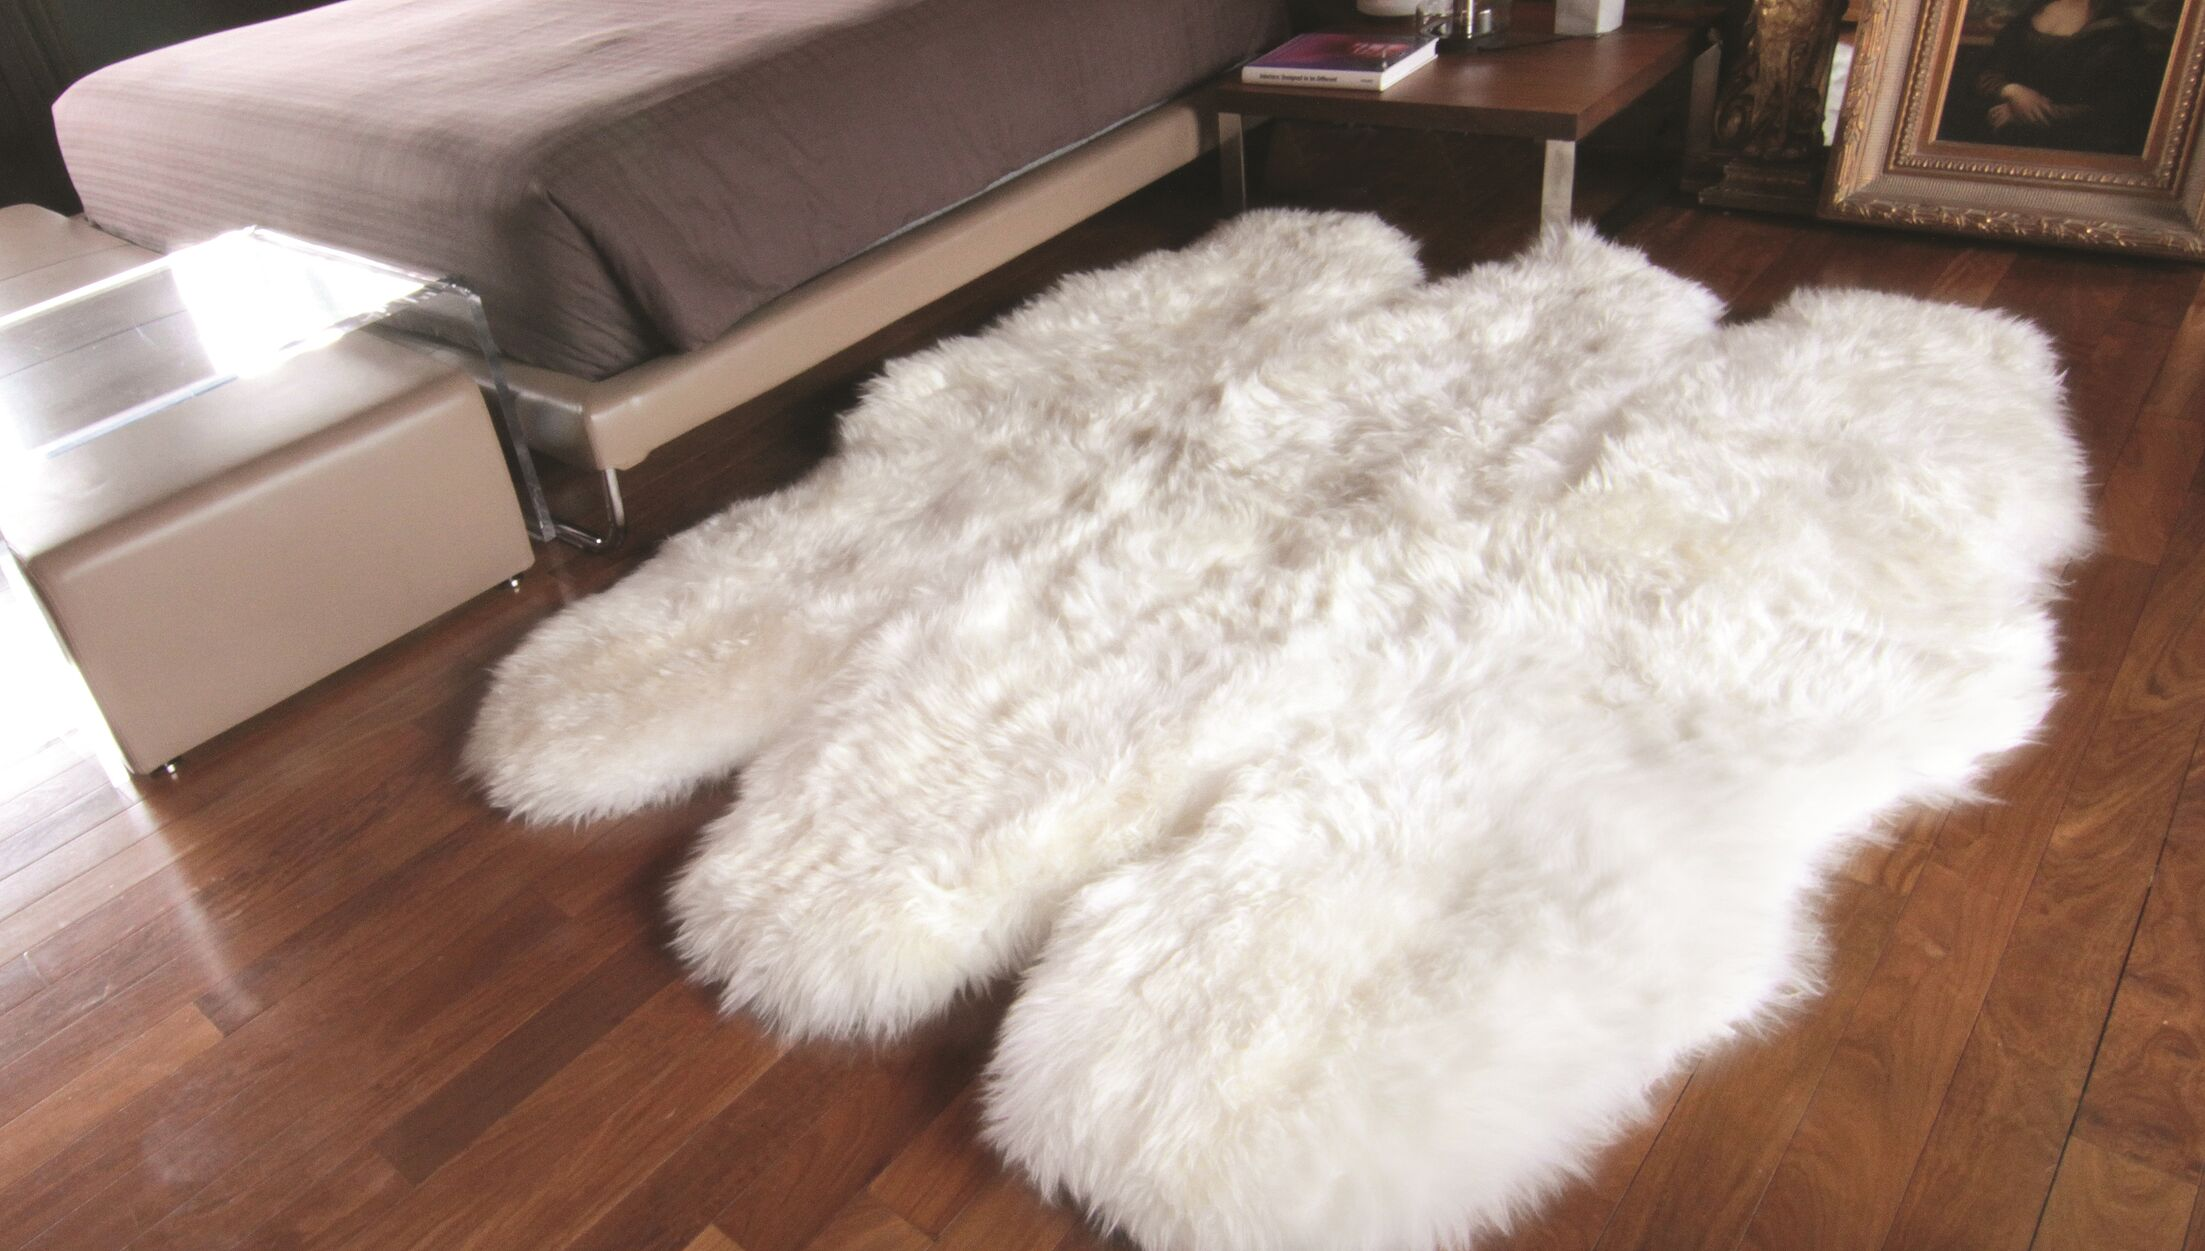 Rolande Hand-Woven Sheepskin White Area Rug Rug Size: 5' x 6'